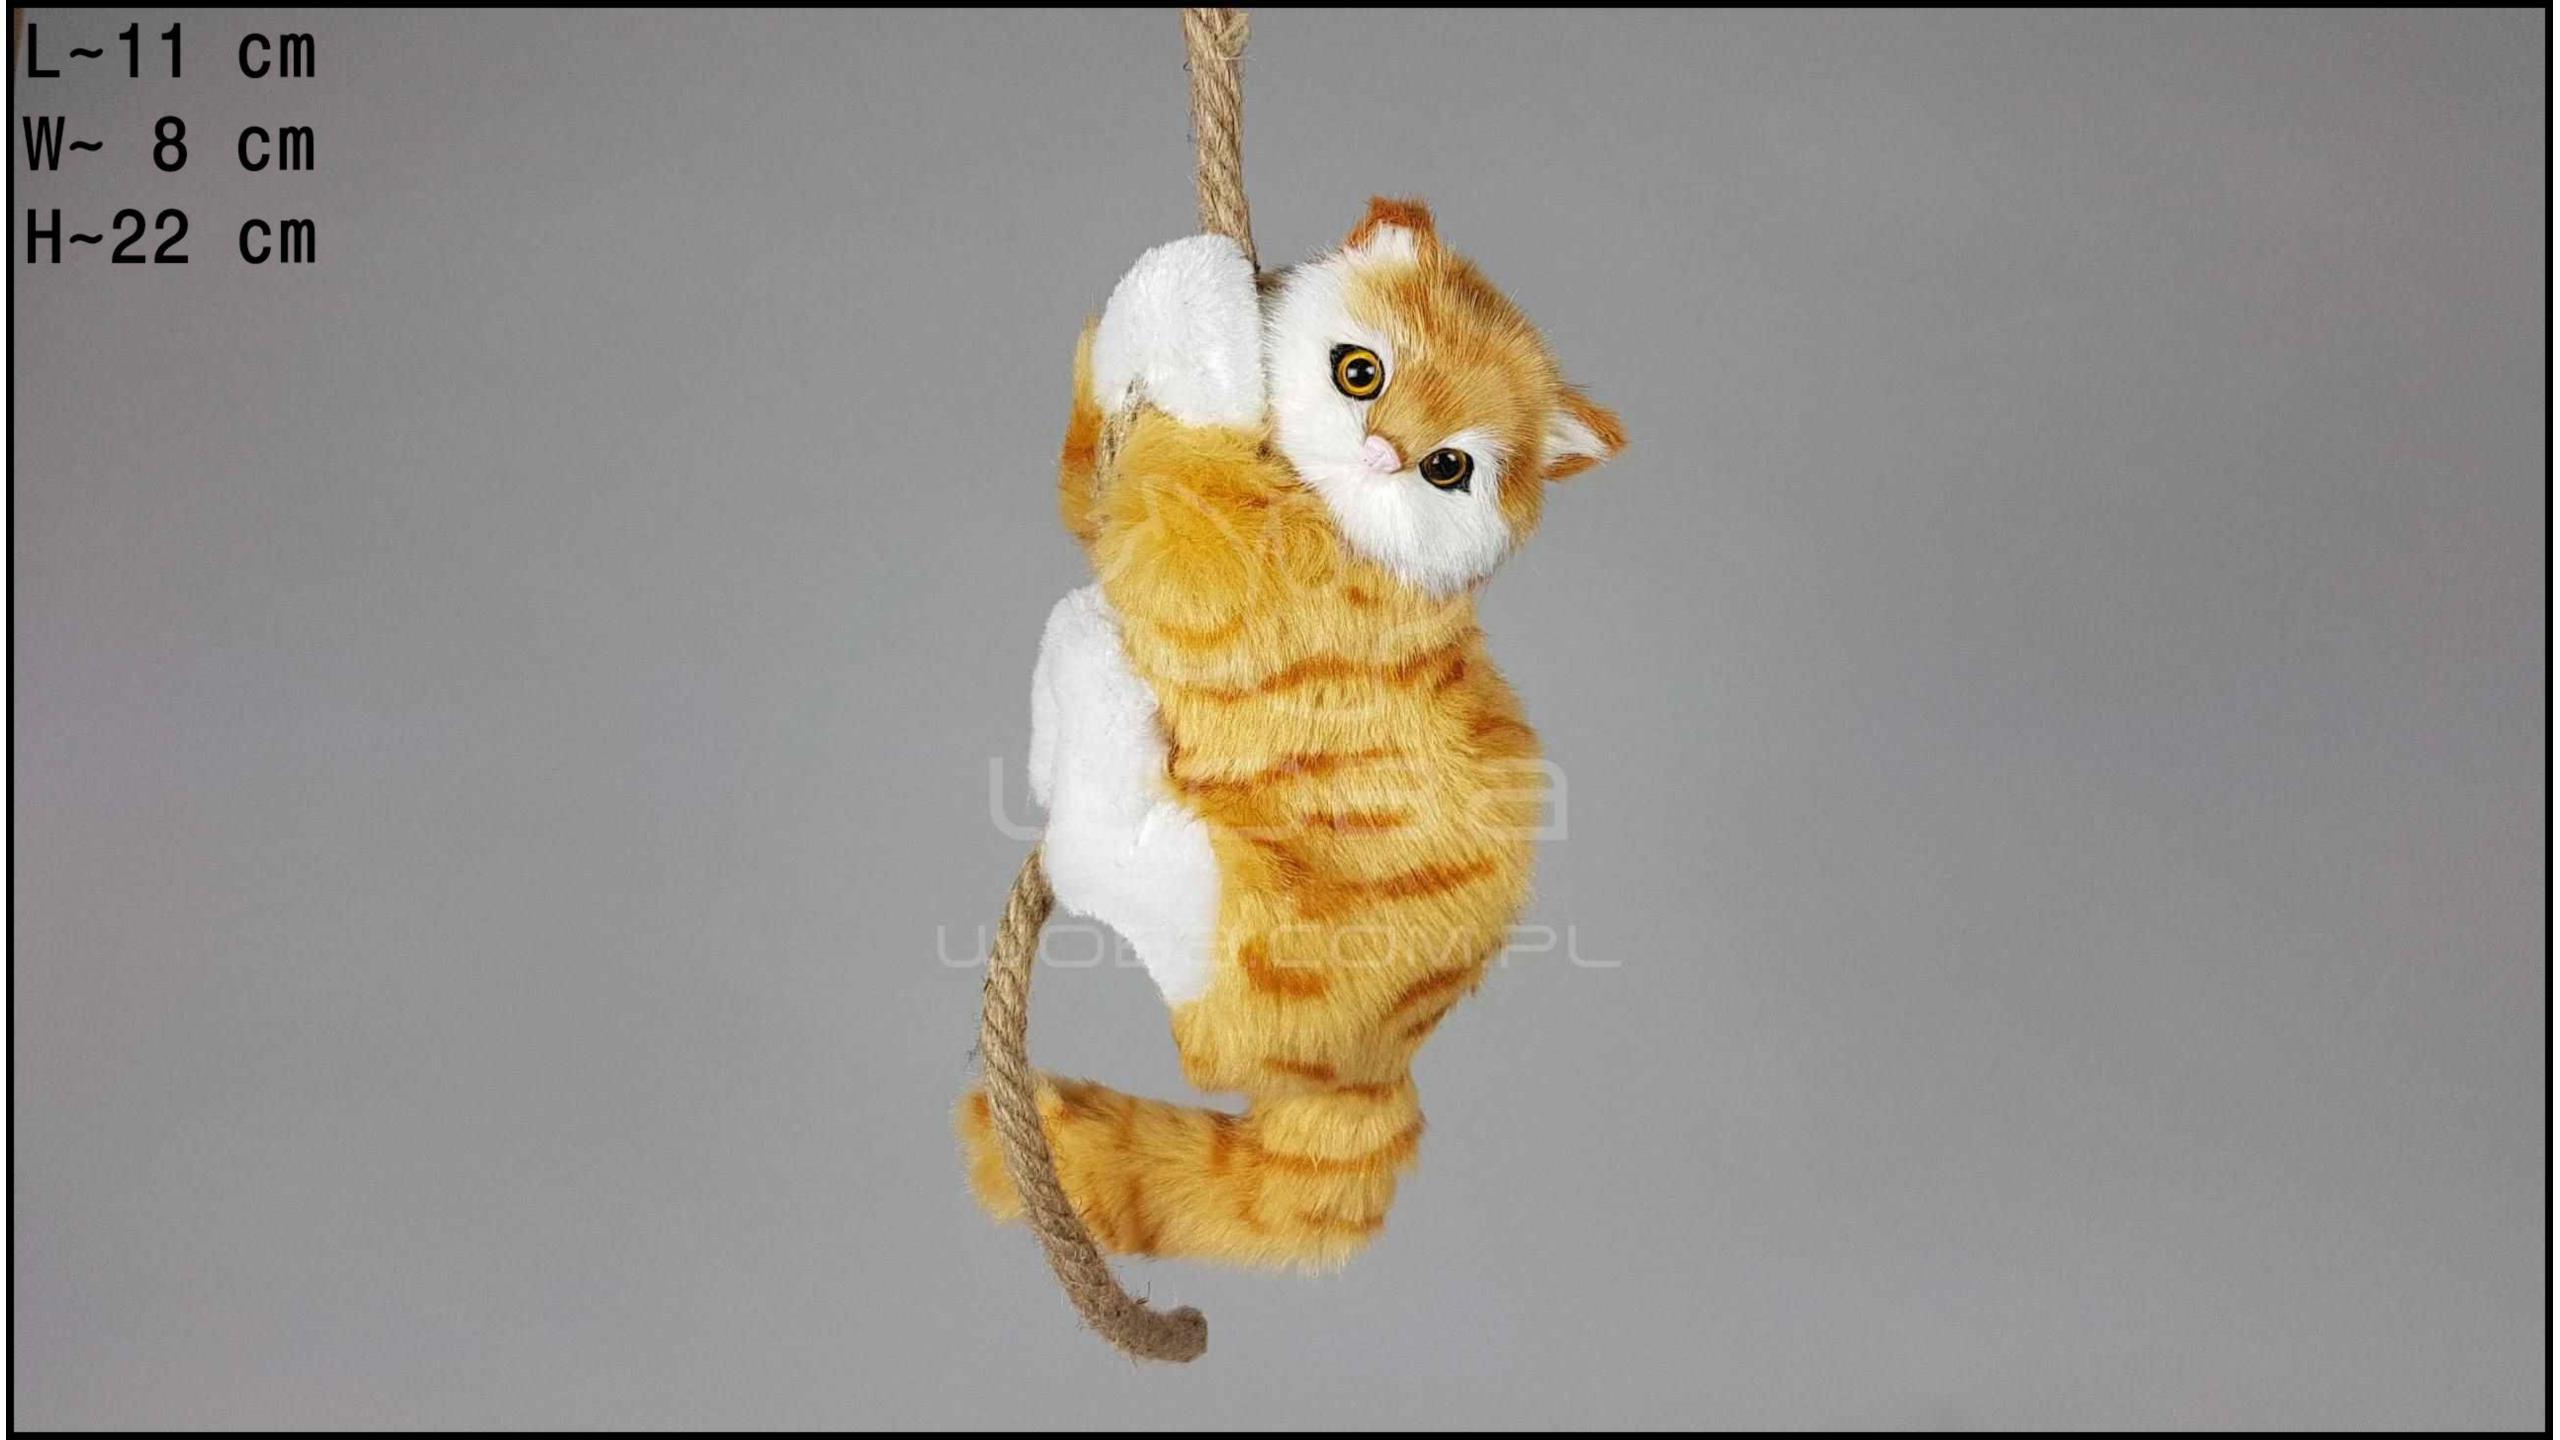 Cat climbing a rope - Auburn